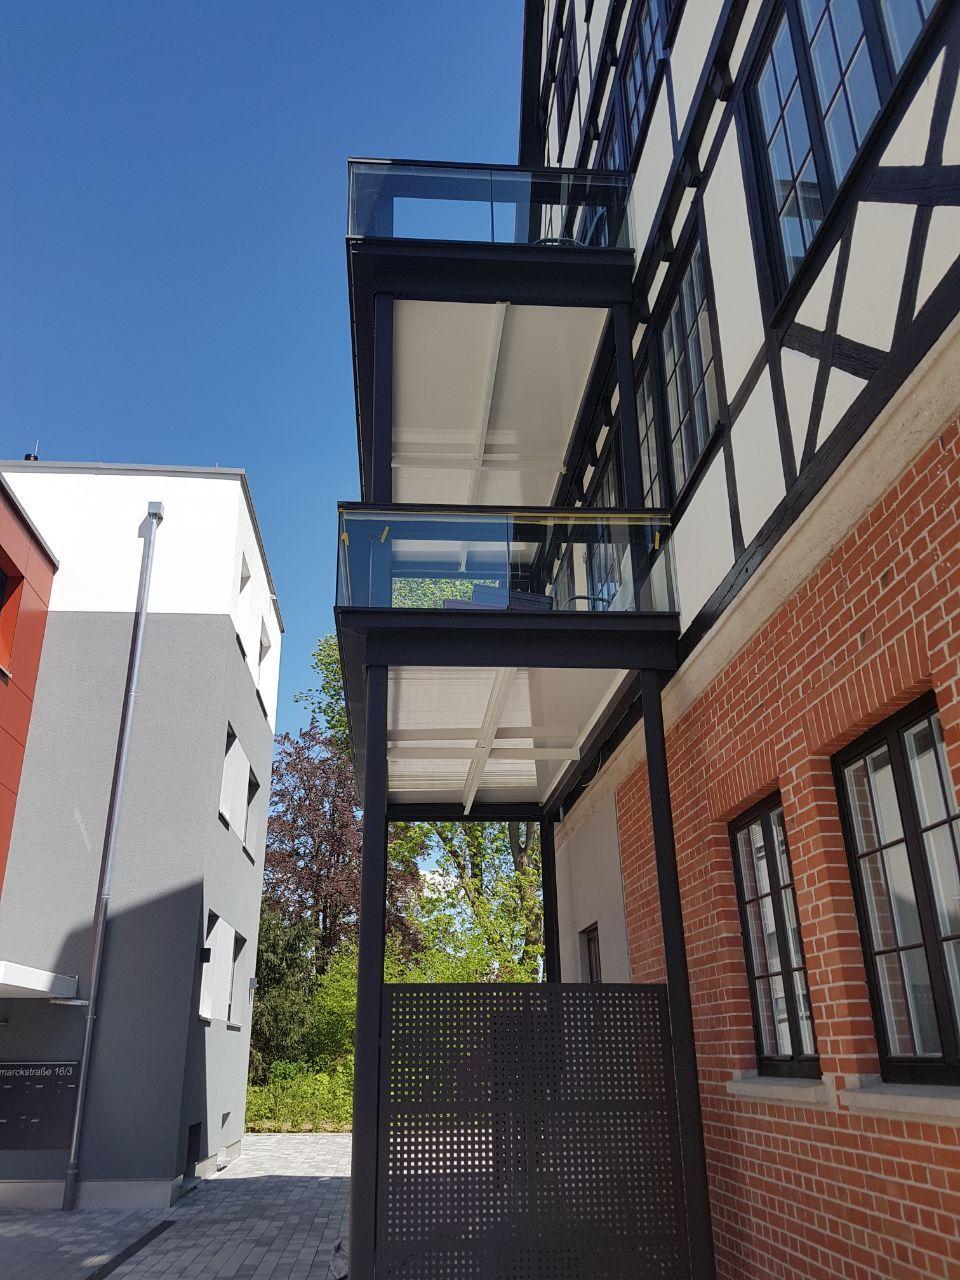 Balkonanbau am Fachwerkhaus Balkon bauen